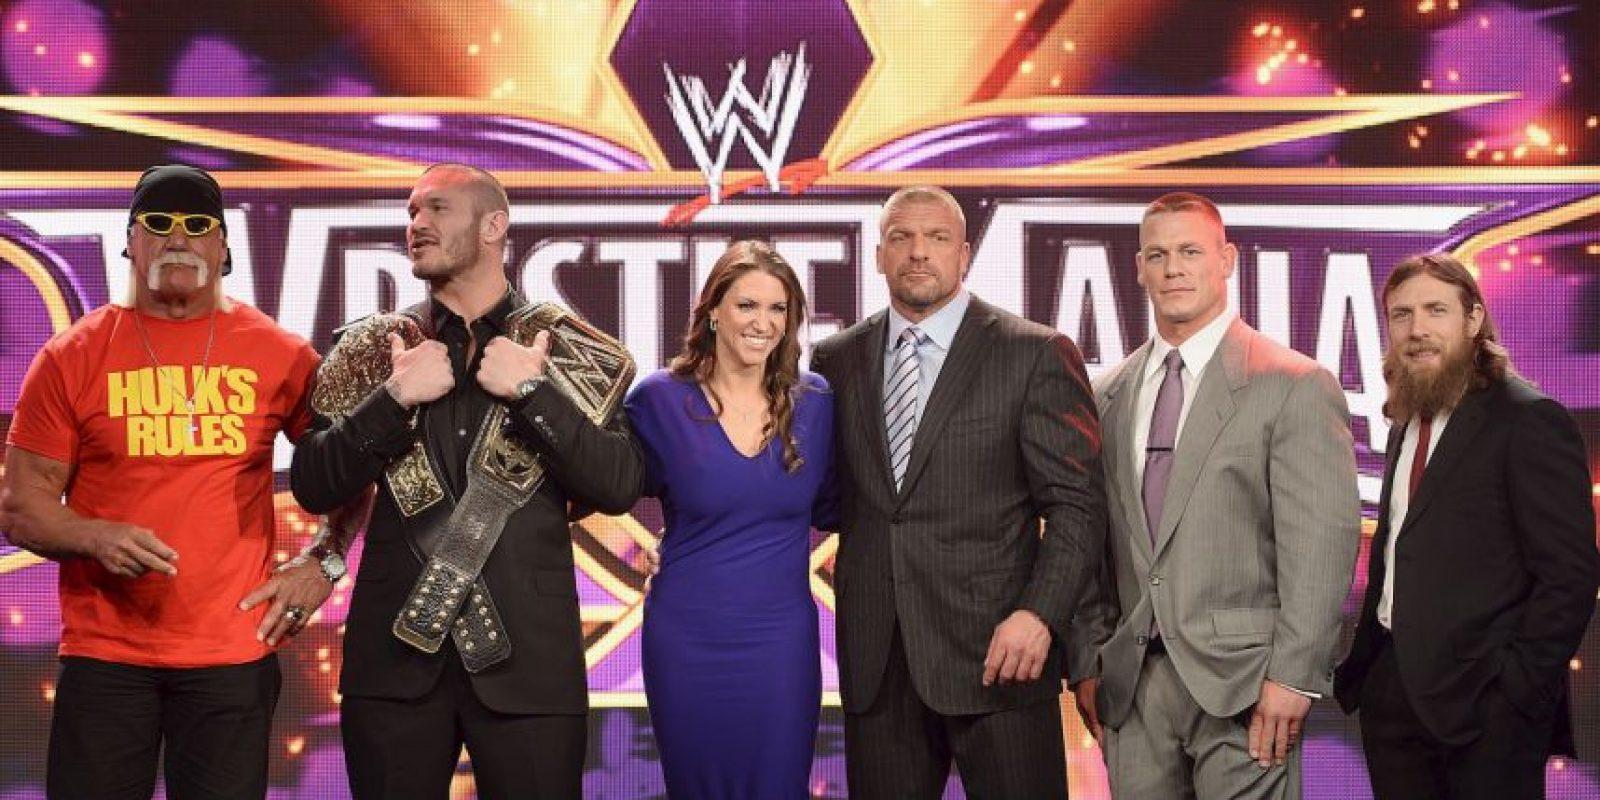 Hulk Hogan podría regresar a WWE para Wrestlemania 33 Foto:Getty Images